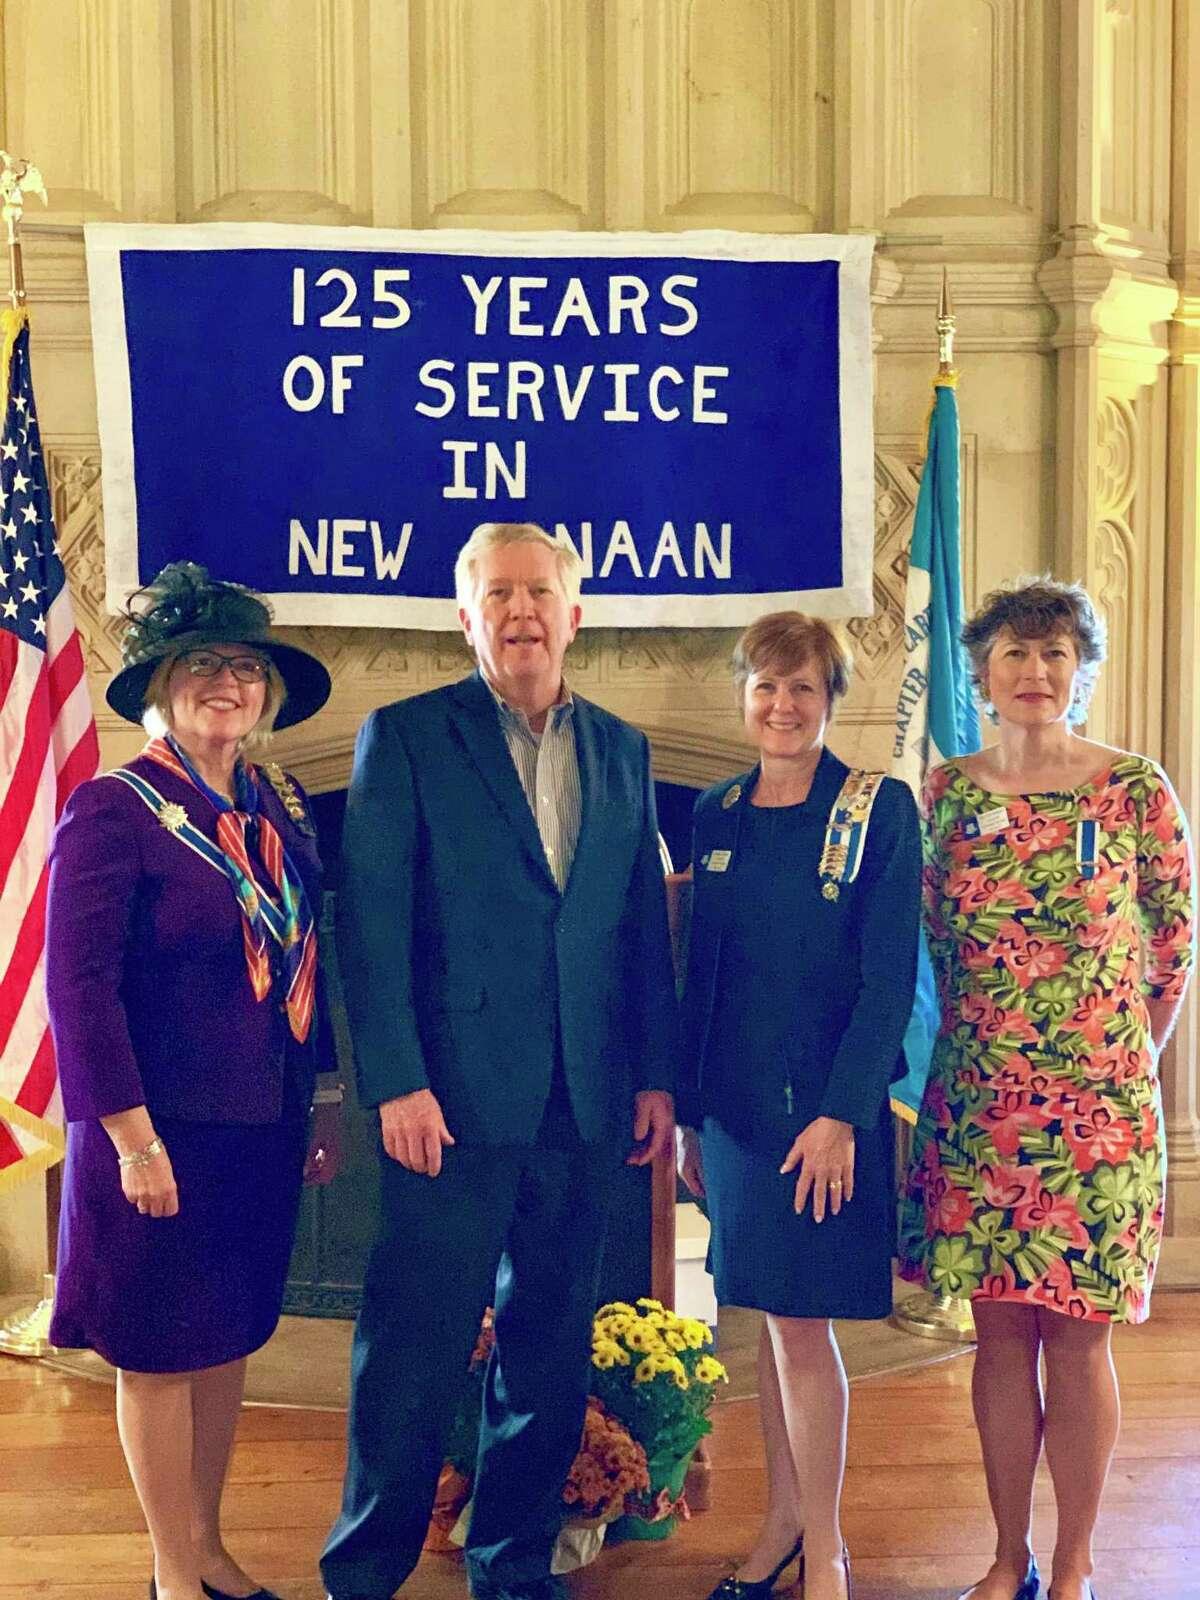 Connecticut State Regent, Christy Anderson Hendrie; New Canaan First Selectman, Kevin Moynihan; Hannah Benedict Carter Chapter Regent, Kathleen Hill Tesluk and Chapter Vice Regent, Rose-Scott Rothbart.